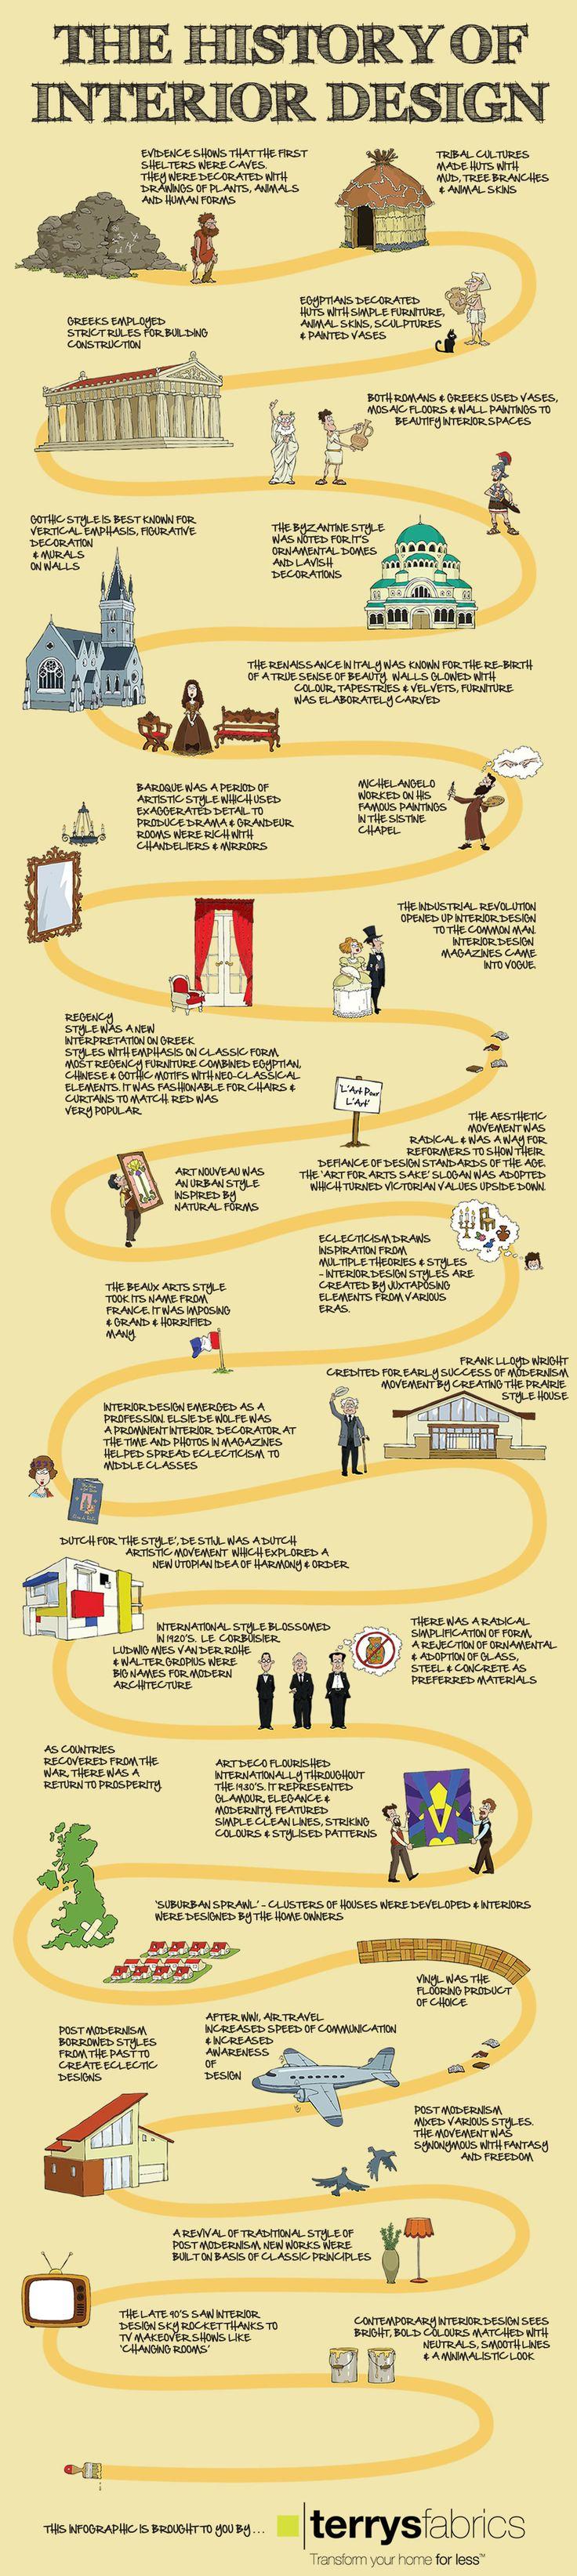 The History of Interior Design